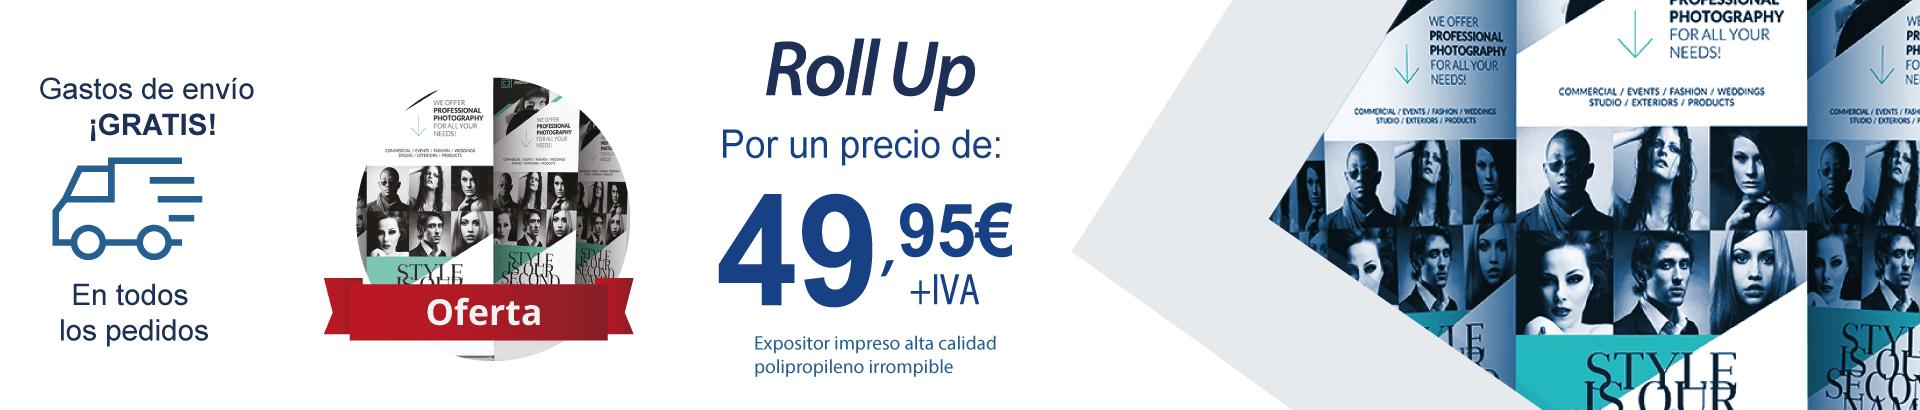 imprimir roll ups baratos